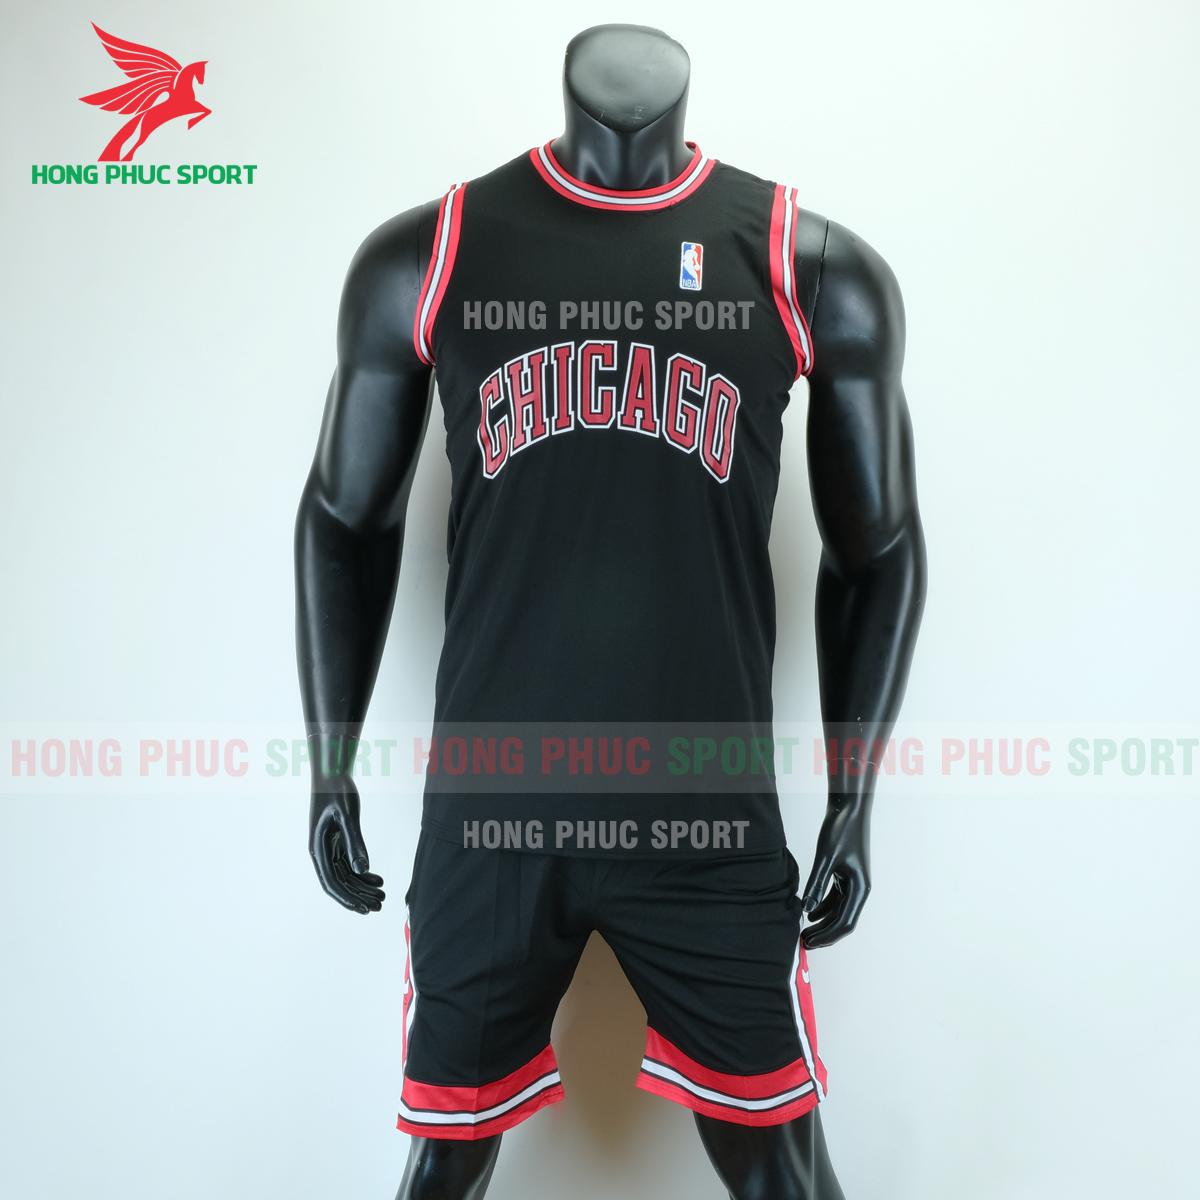 https://cdn.hongphucsport.com/unsafe/s4.shopbay.vn/files/285/ao-bong-ro-bulls-mau-den-6-5f76dcc9e7c34.png